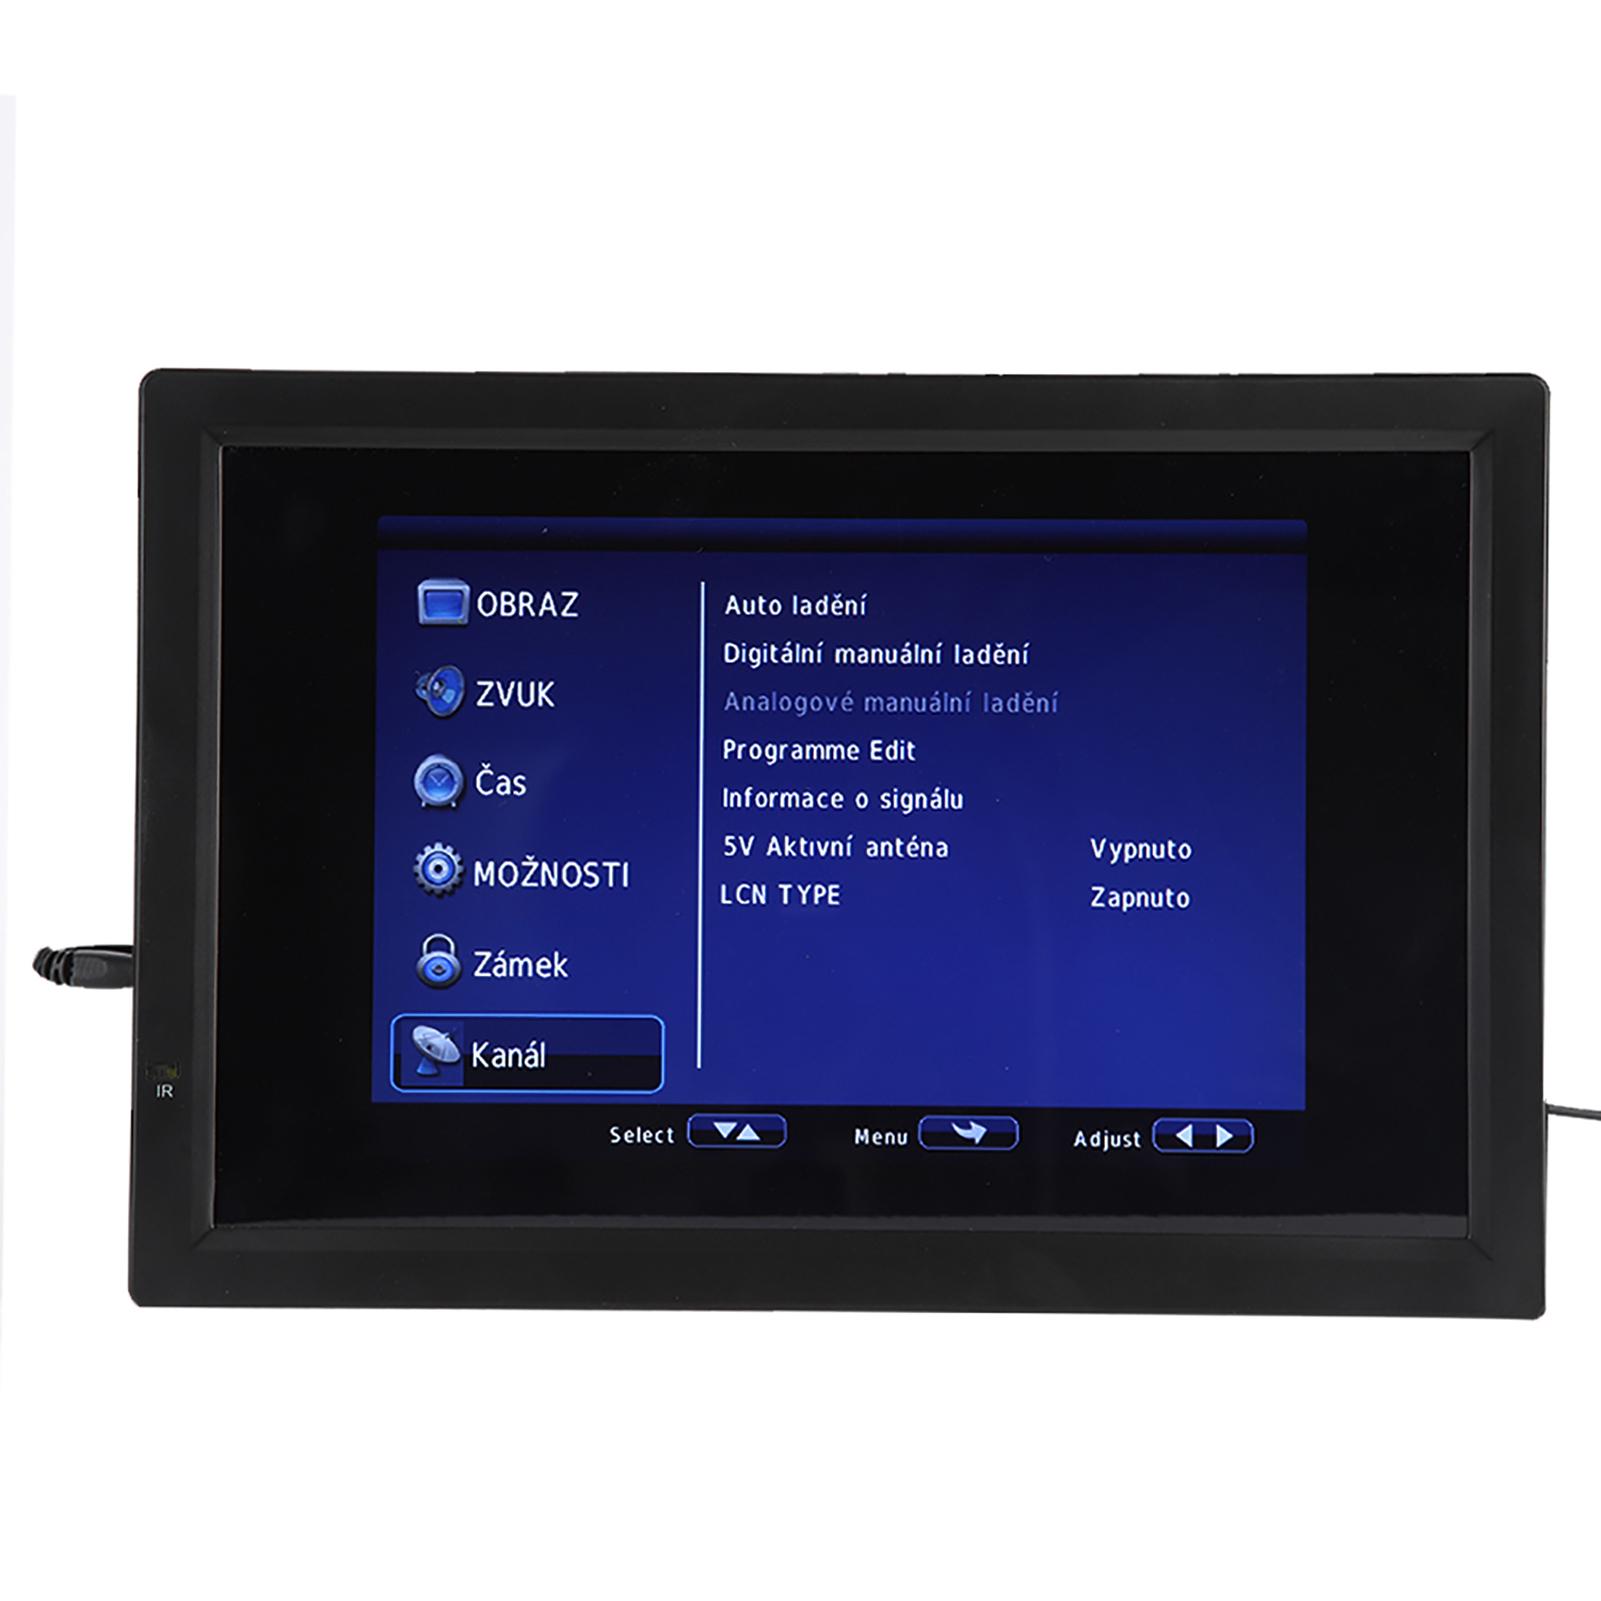 Freeview-1080P-HDMI-HD-14-039-039-Portable-TV-Digital-Television-Player-PVR-USB-DC-AC thumbnail 21